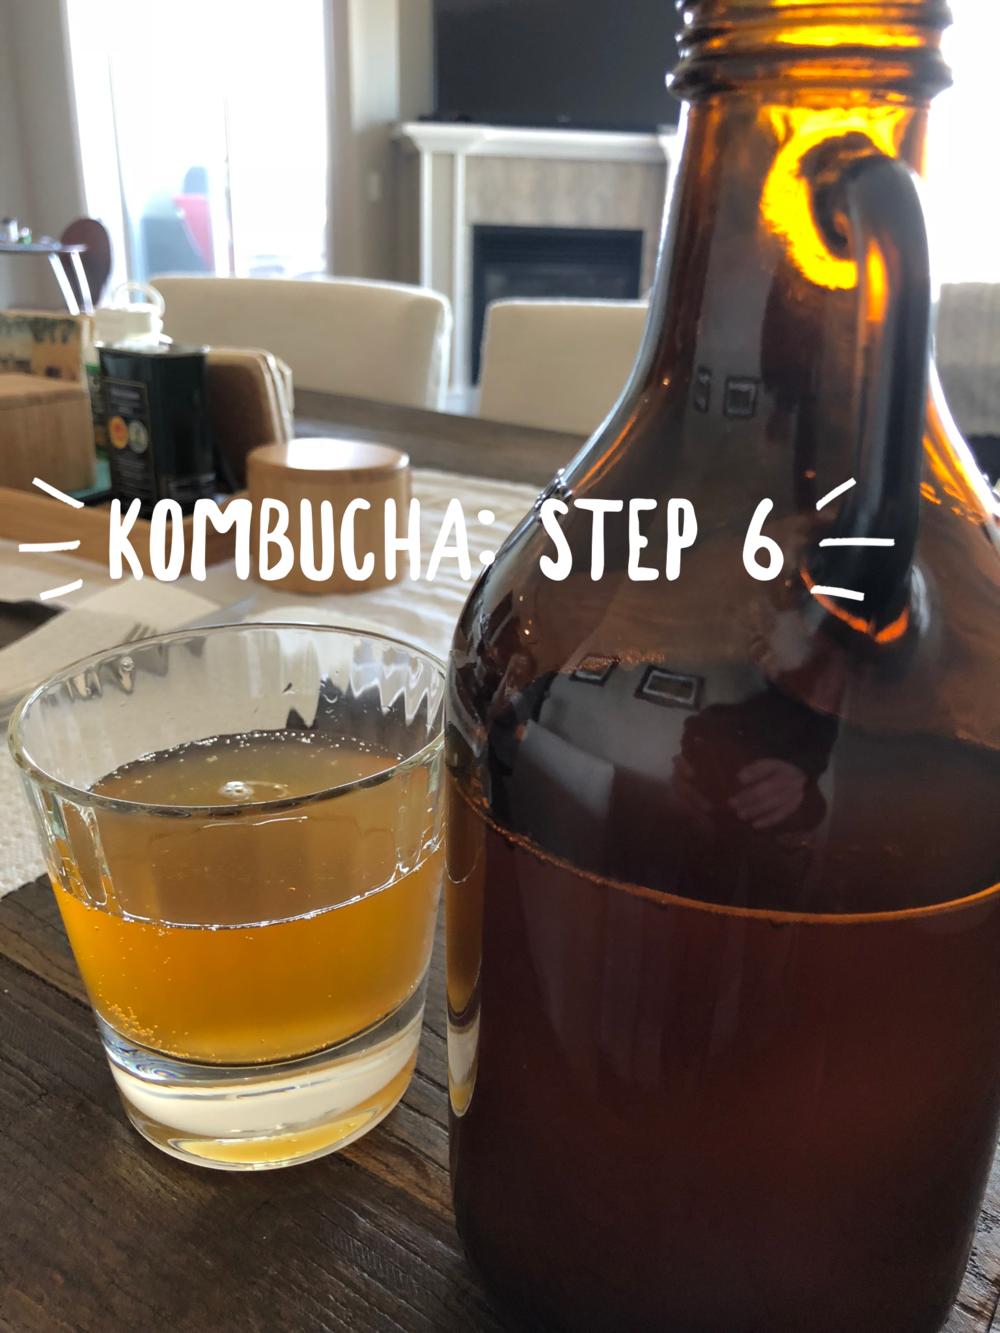 kombucha-step-6